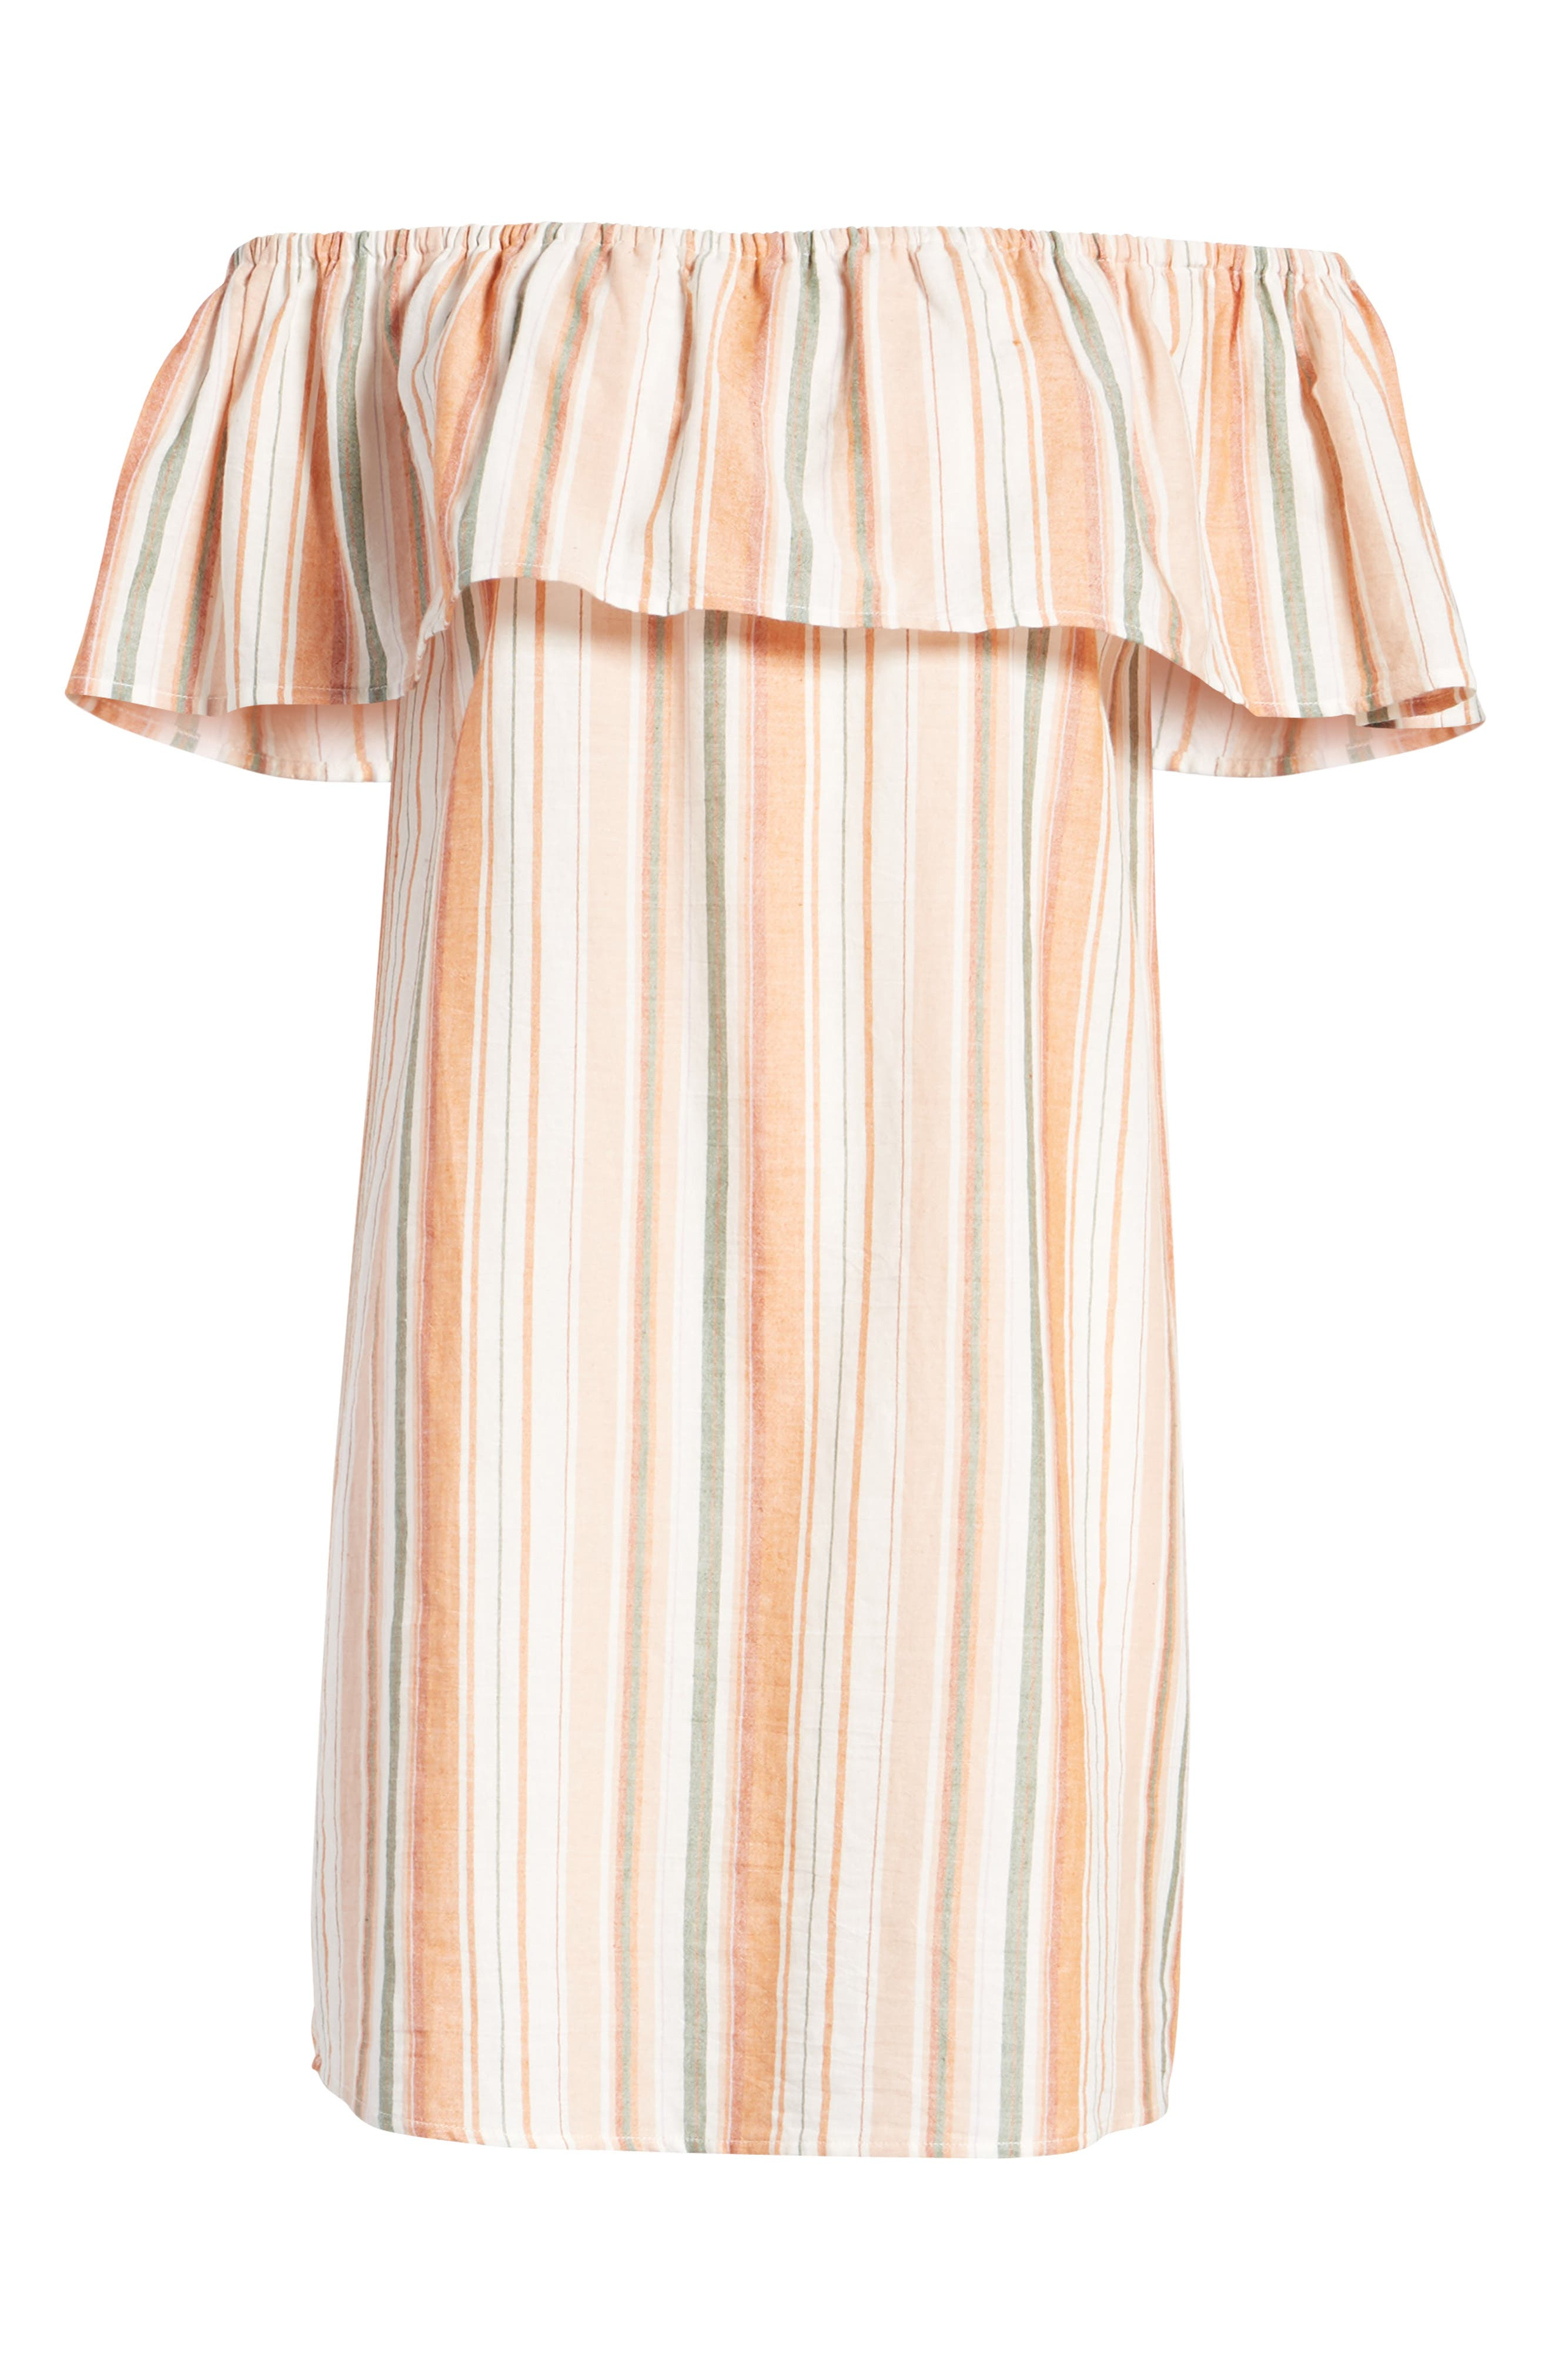 Bishop + Young Sunset Stripe Off the Shoulder Dress,                             Alternate thumbnail 7, color,                             Orange White Stripe